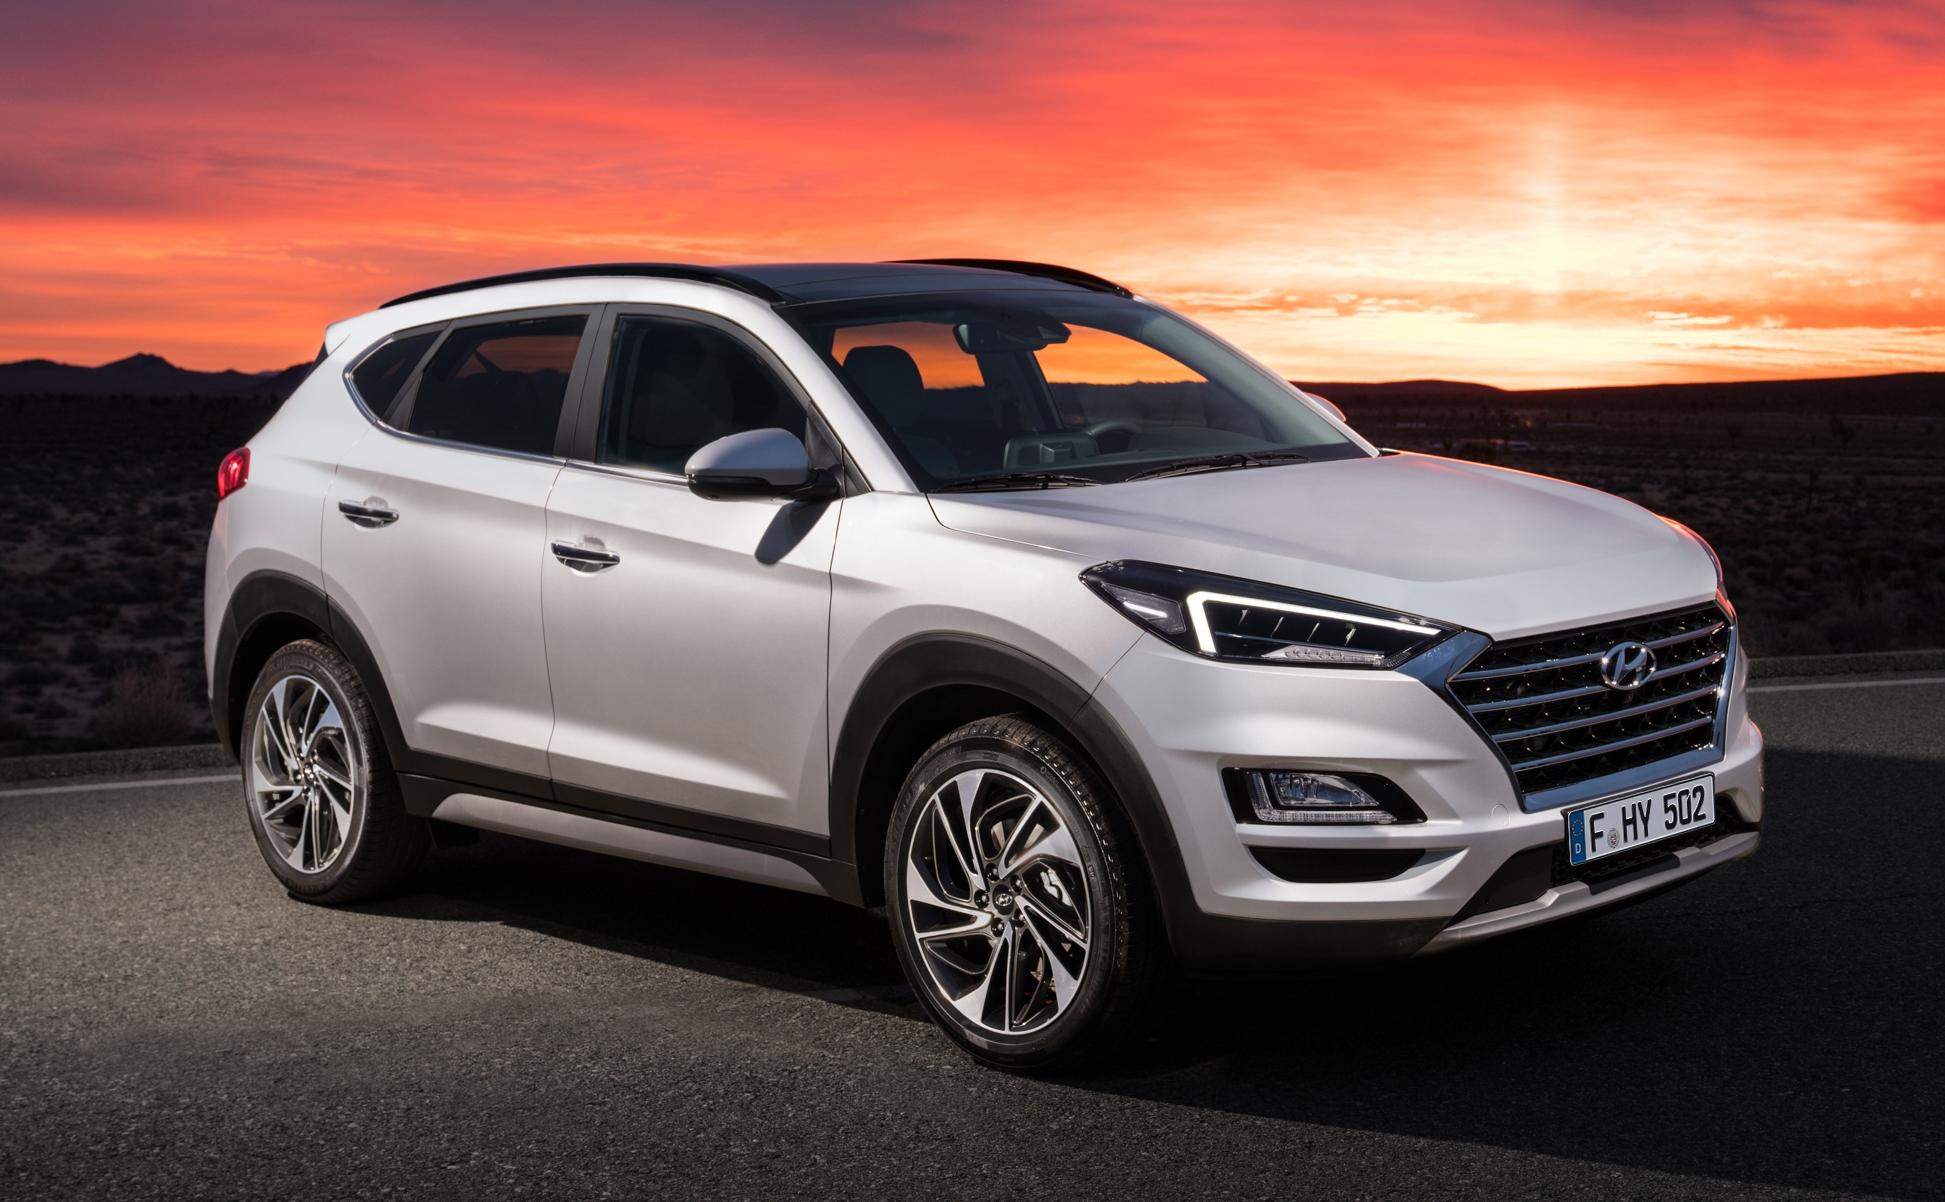 Fiyatı belli oldu: Makyajlı Hyundai Tucson